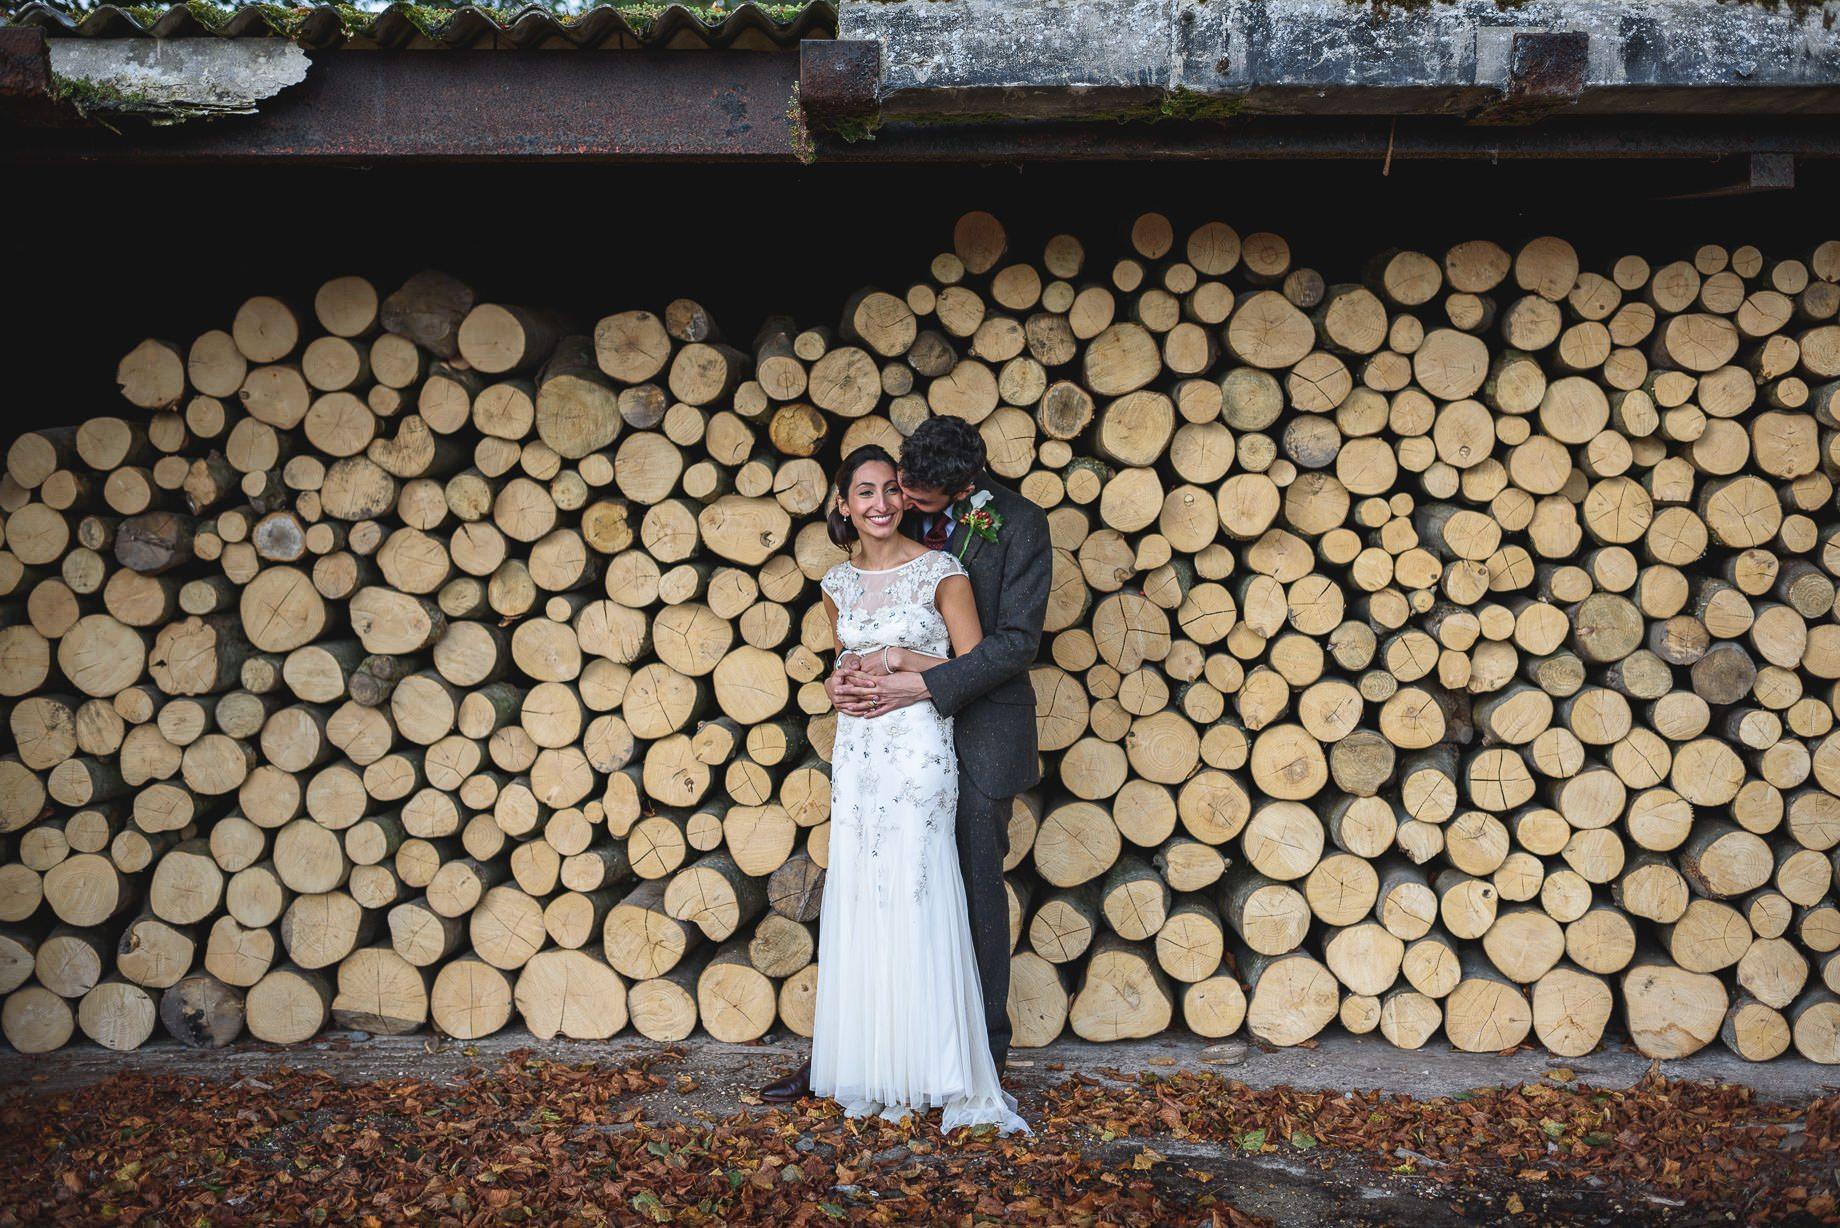 bury-court-barn-wedding-photography-guy-collier-photography-nadia-tom-77-of-184